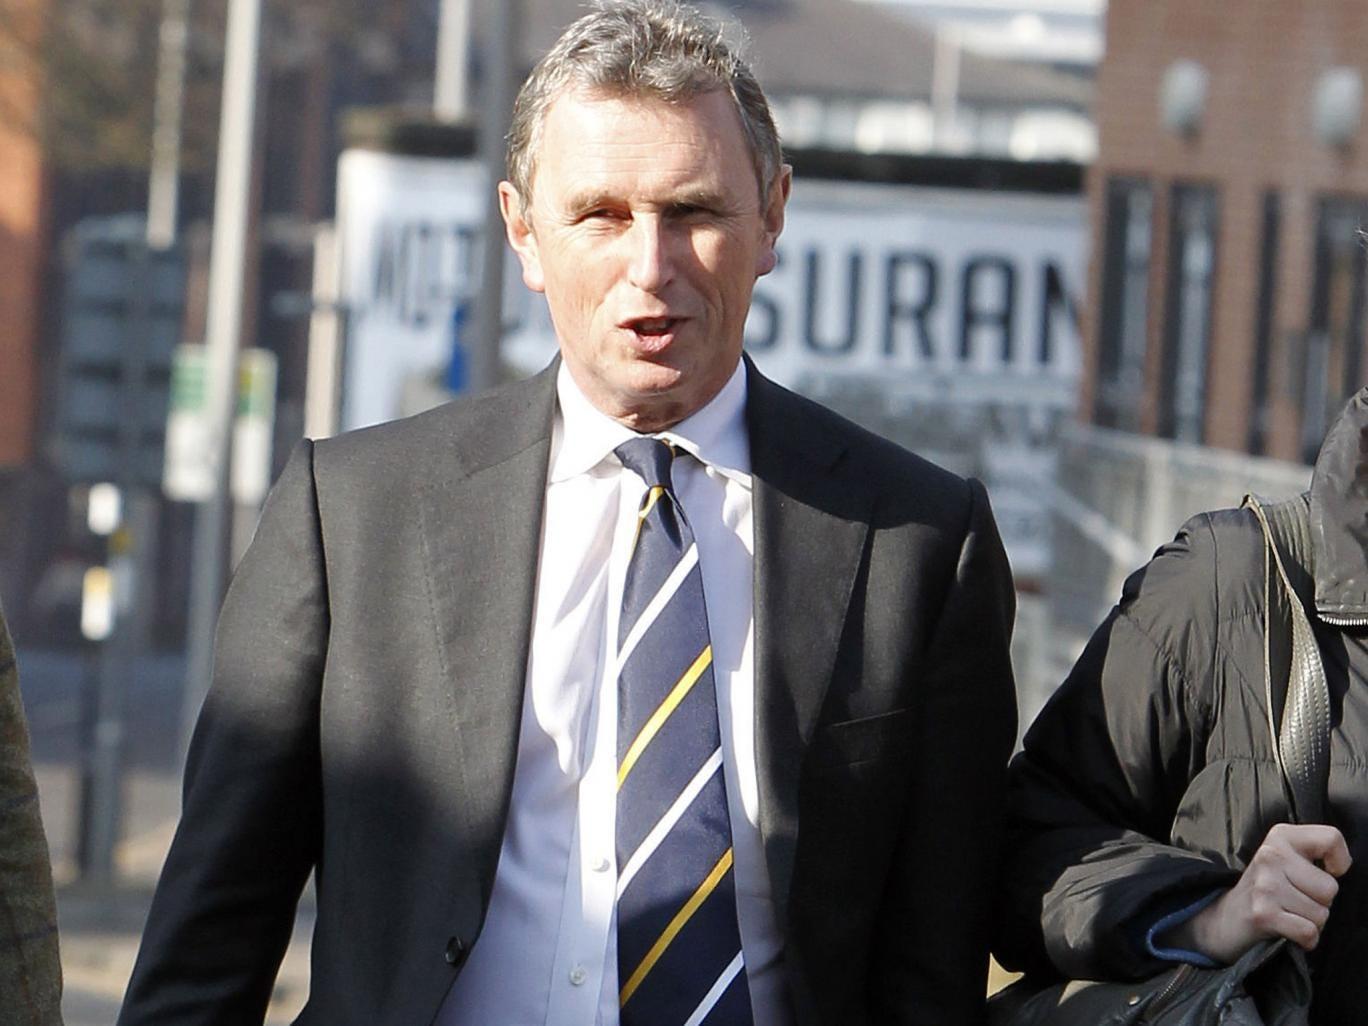 Nigel Evans, the former deputy speaker of the House of Commons, arrives at Preston Crown Court